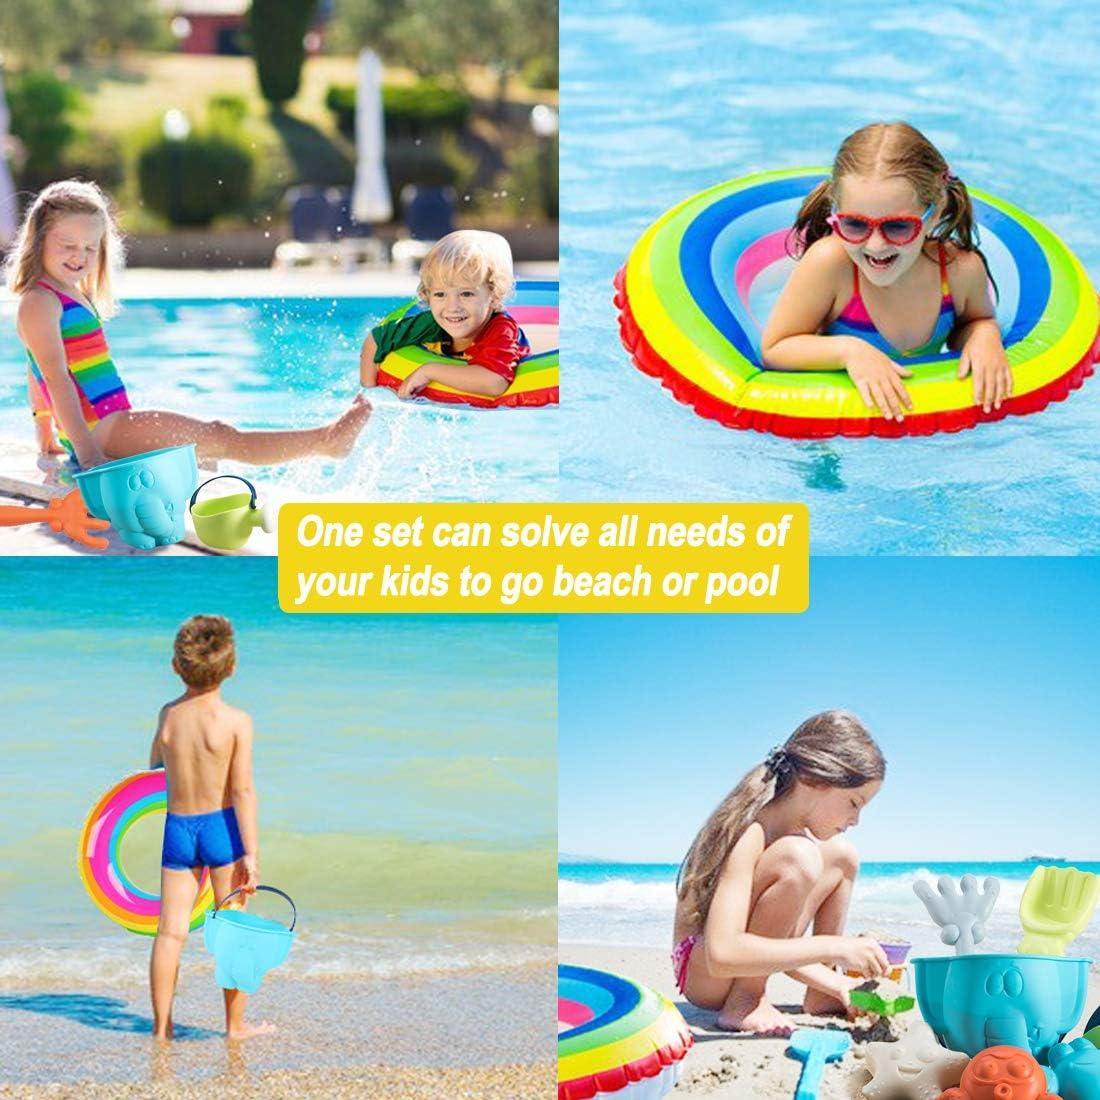 WTOR Beach Toys 21Pcs Sand Toy Sandbox Vehicle Swimming Ring Beach Bucket and Shovel Sandbox Toys with Mesh Bag for Toddlers Kids